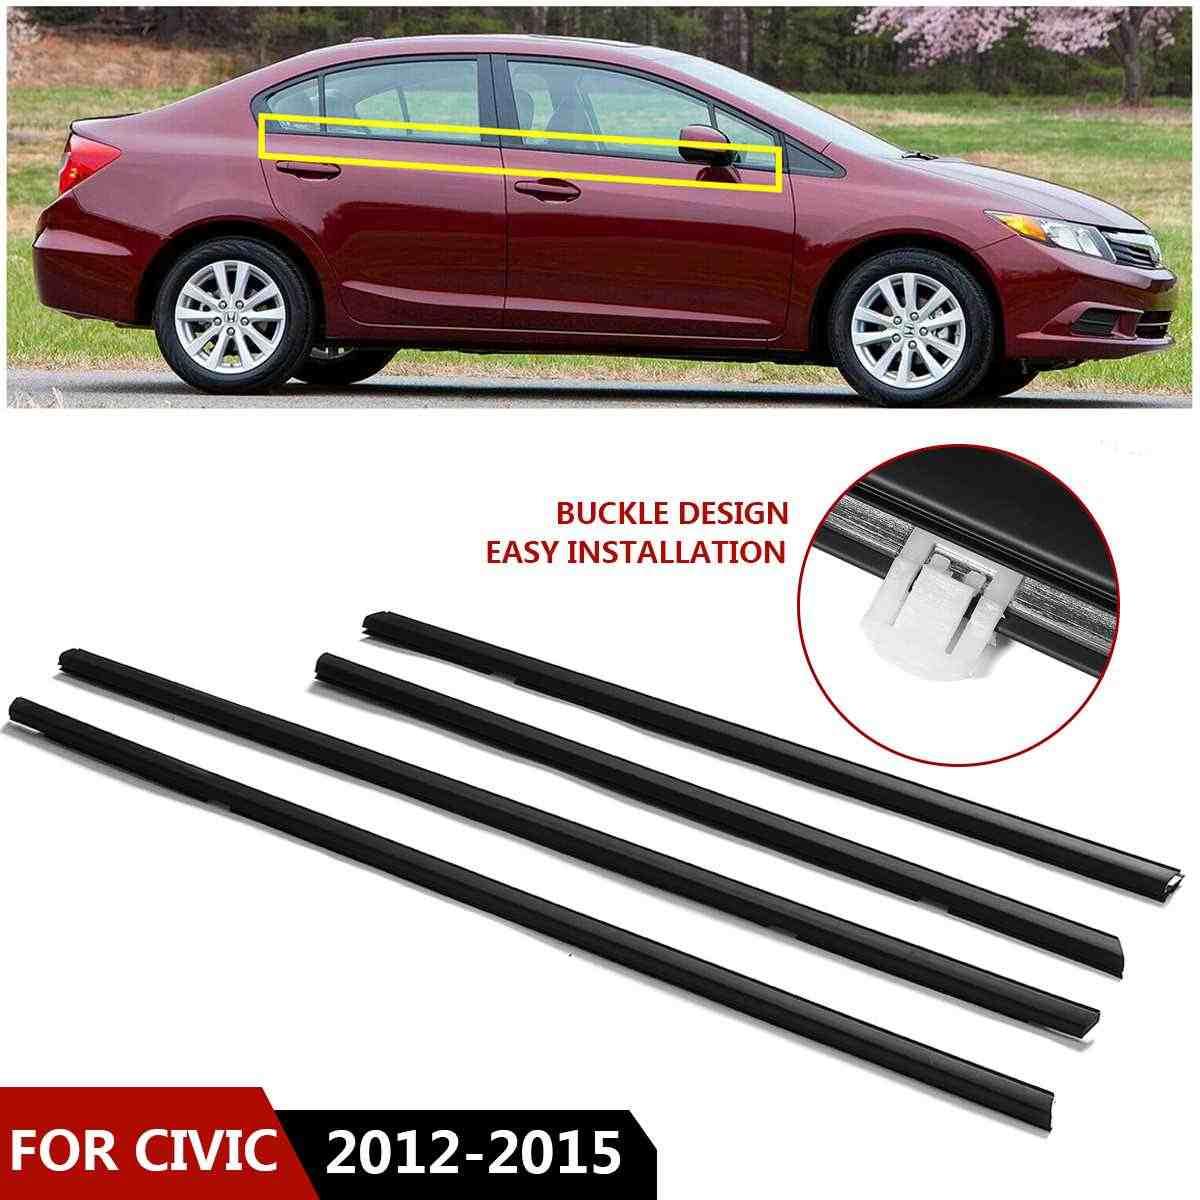 4pcs Car Weatherstrip Window Moulding Trim Seal Belt fit for Honda Civic 2012-2015#72410TR0A01